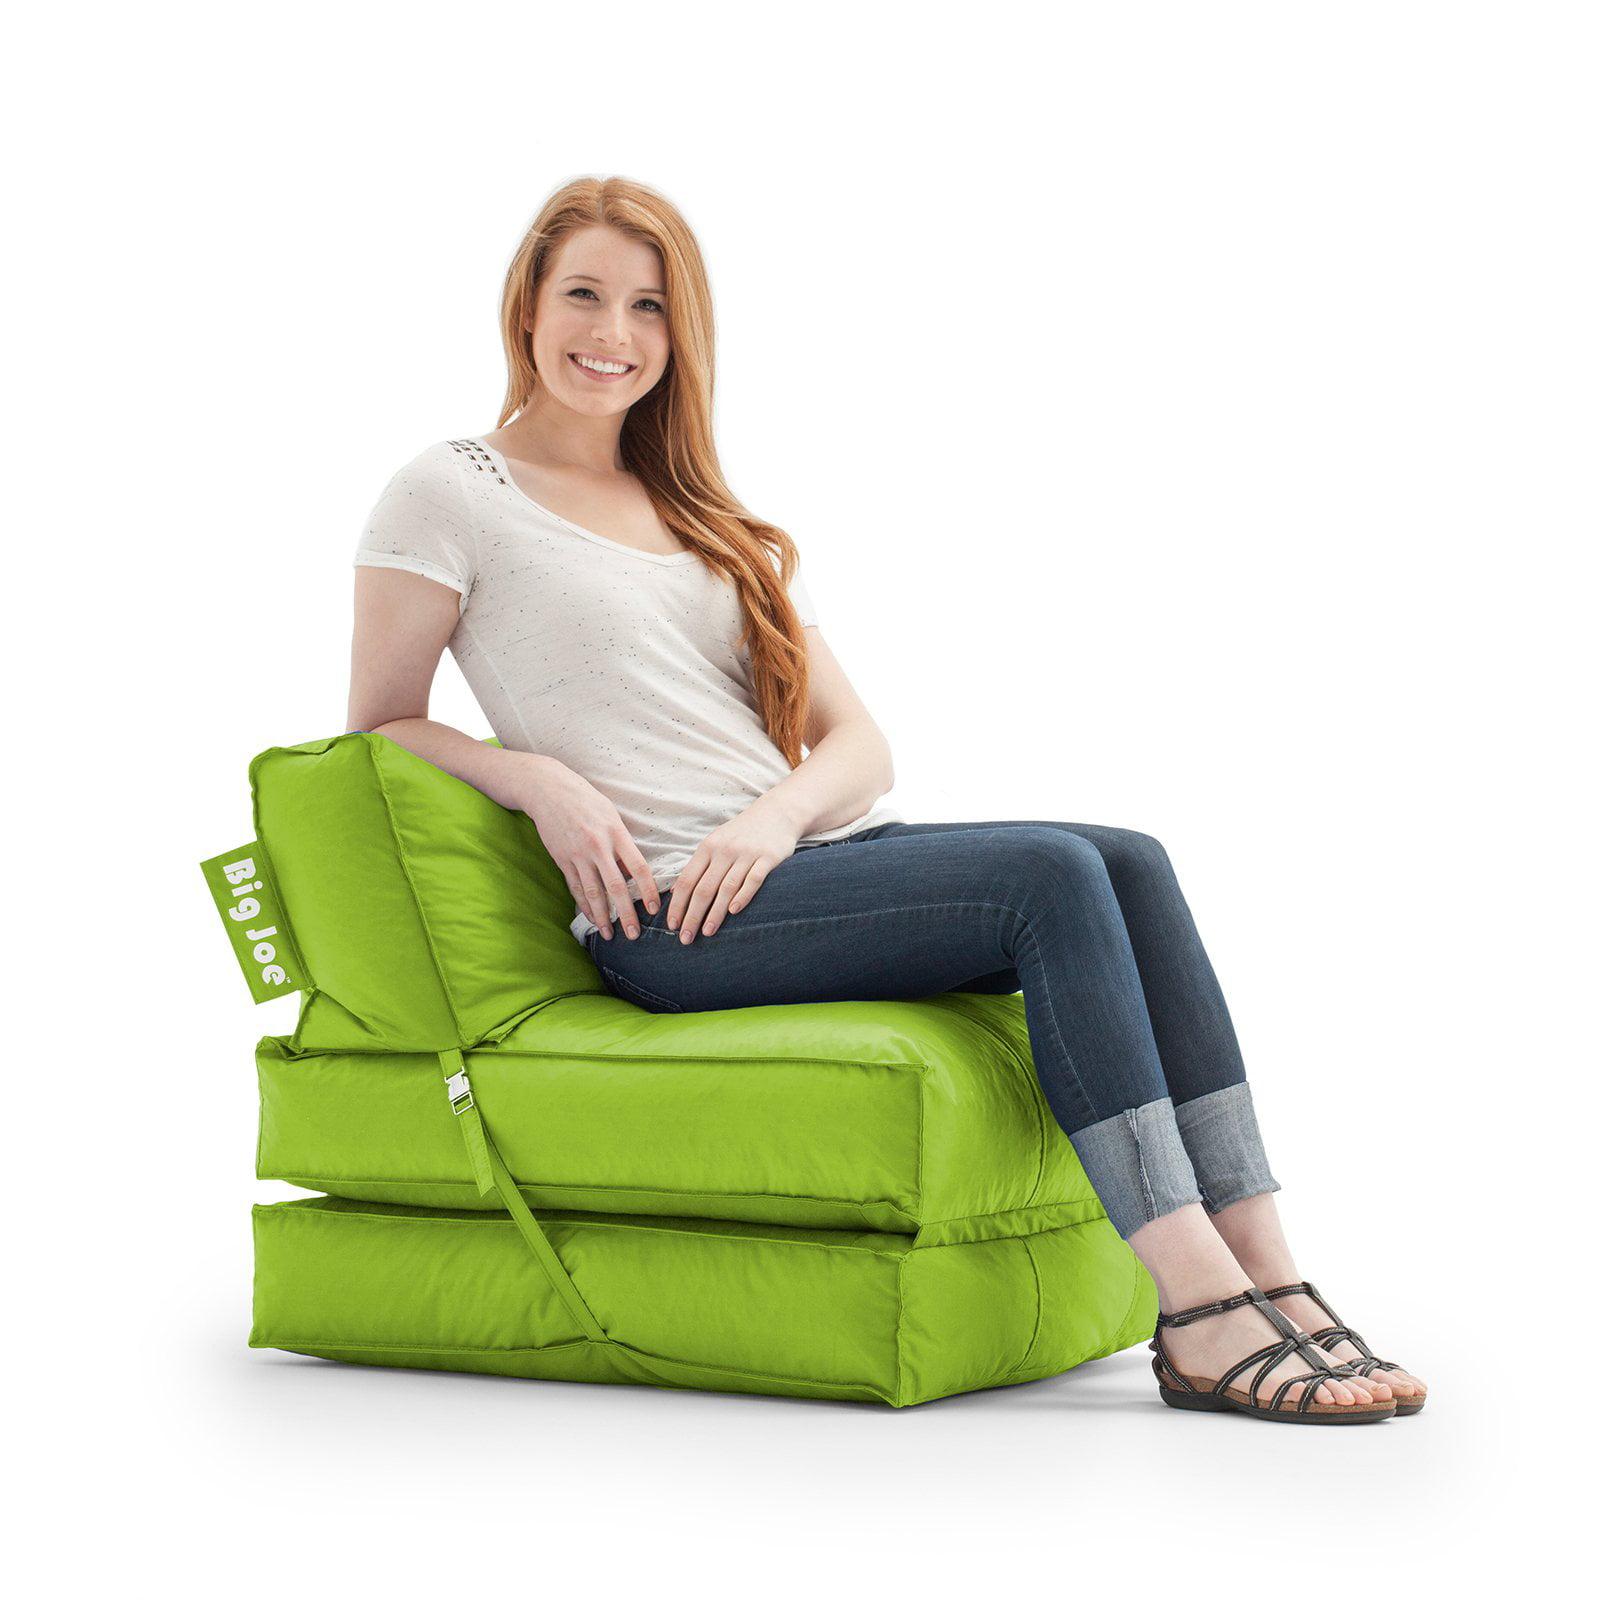 Astounding Big Joe Flip Lounger Bean Bag Chair Ibusinesslaw Wood Chair Design Ideas Ibusinesslaworg